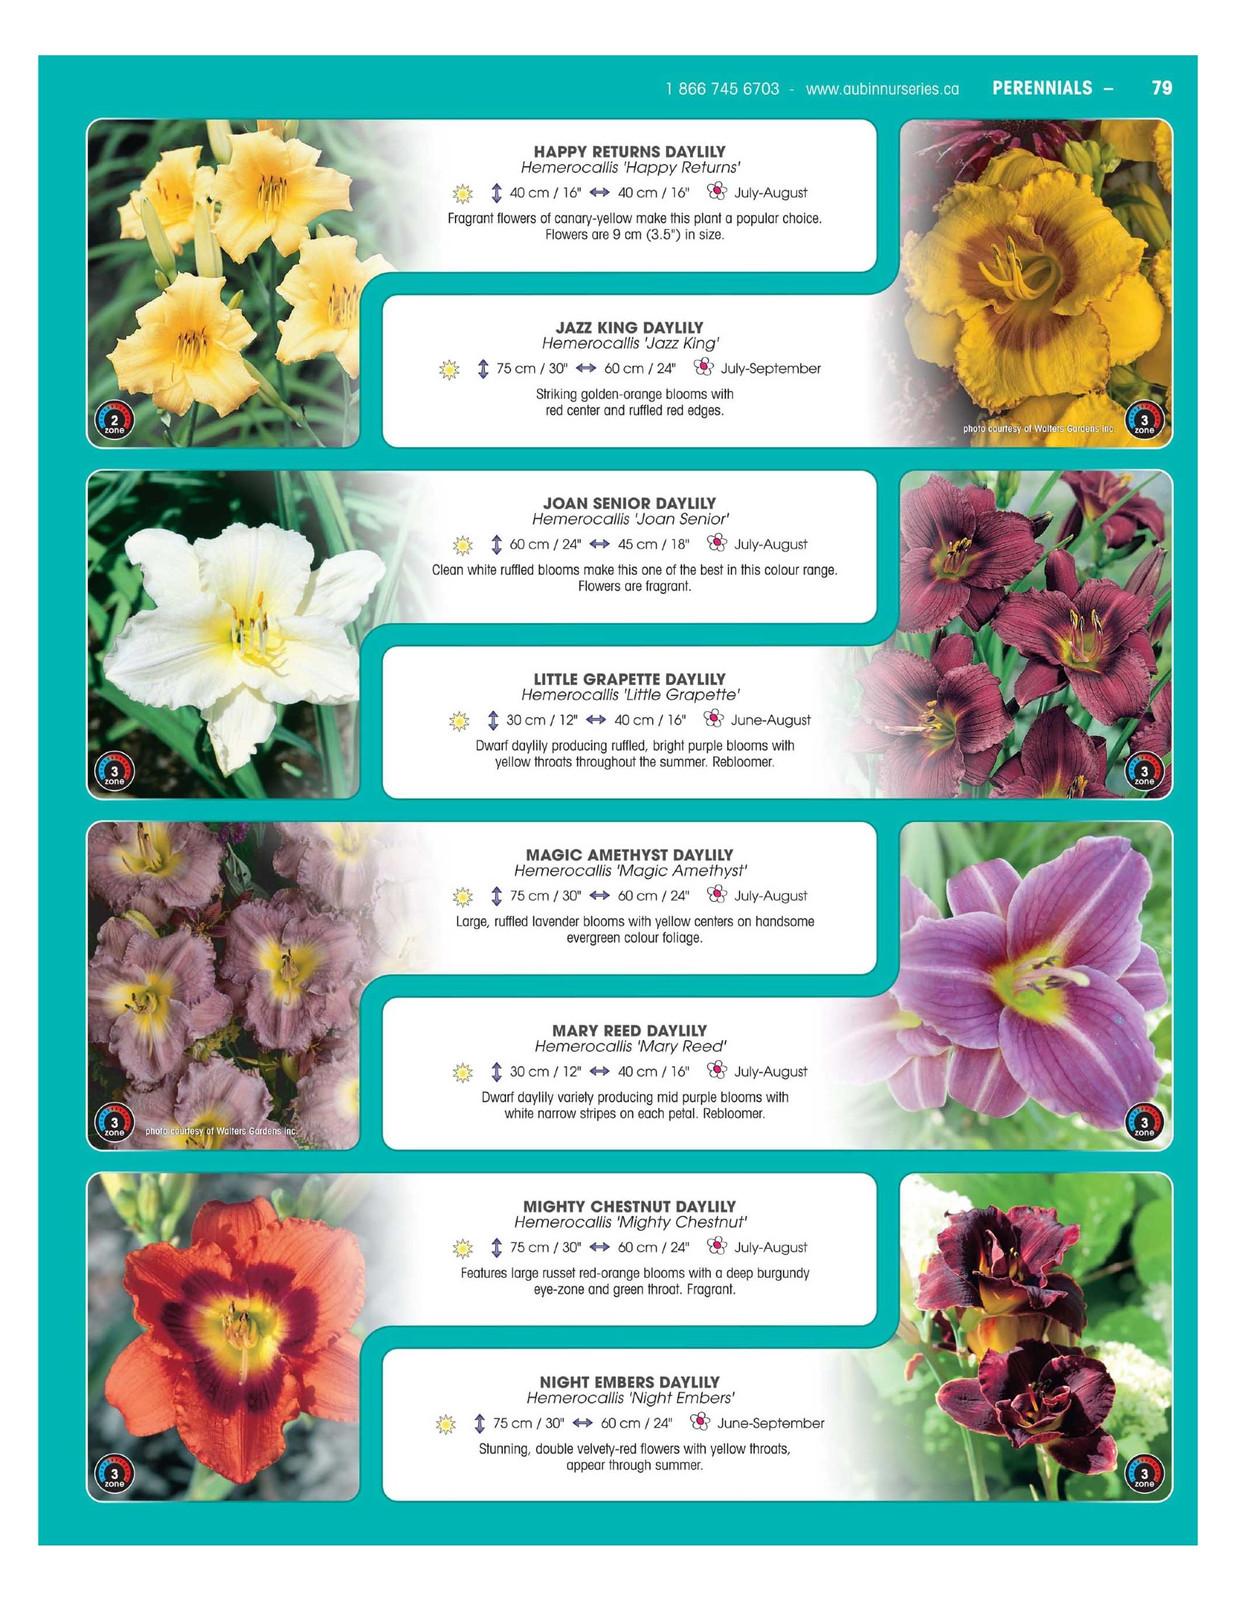 Aubinnurseries Perennials